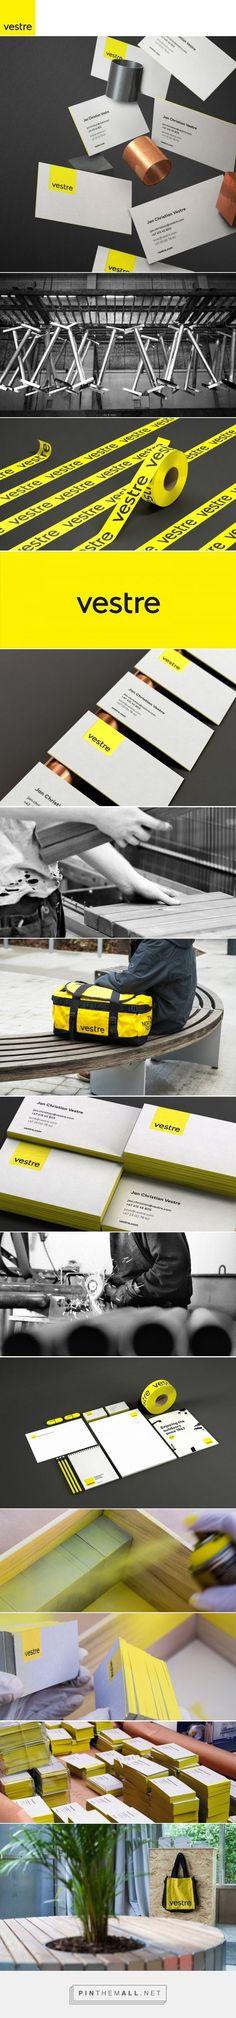 Vestre Outdoor Furniture Branding by Tank Design | Fivestar Branding Agency – Design and Branding Agency & Curated Inspiration Gallery #branding #designinspiration #design